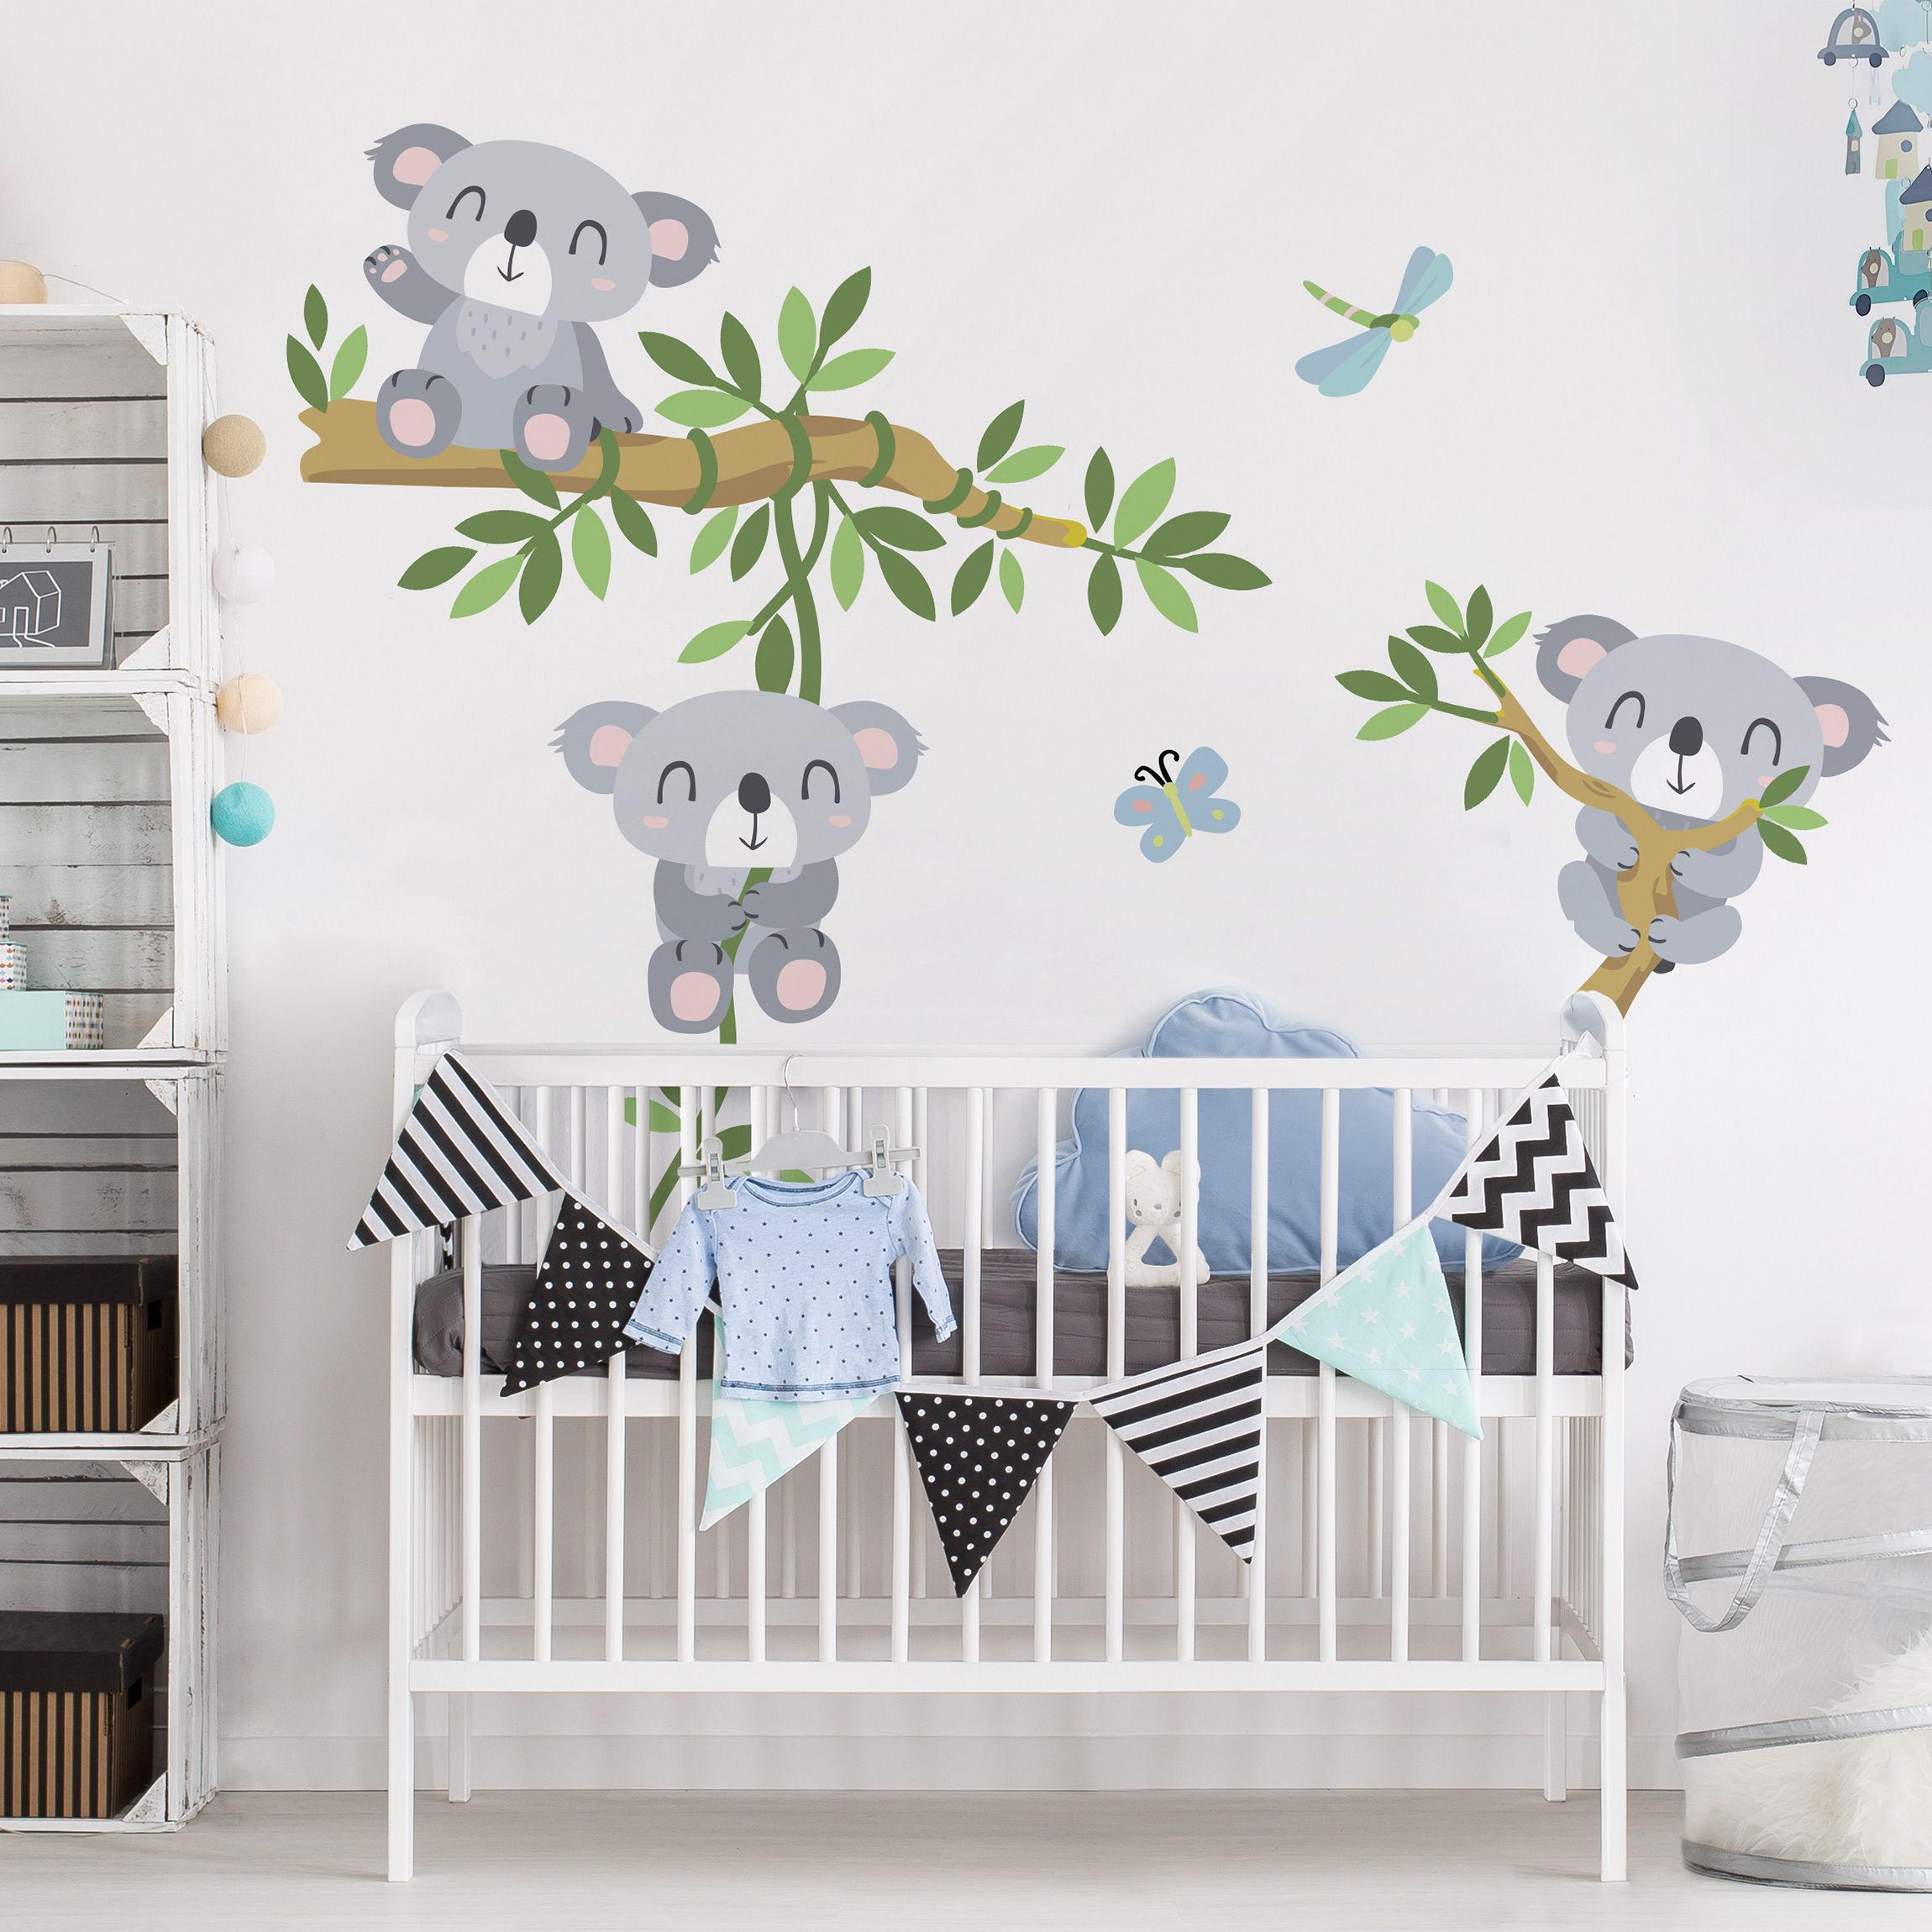 Full Size of Wandsticker Kinderzimmer Junge Wandtattoo Koala Set In 2020 Küche Sofa Regal Weiß Regale Kinderzimmer Wandsticker Kinderzimmer Junge